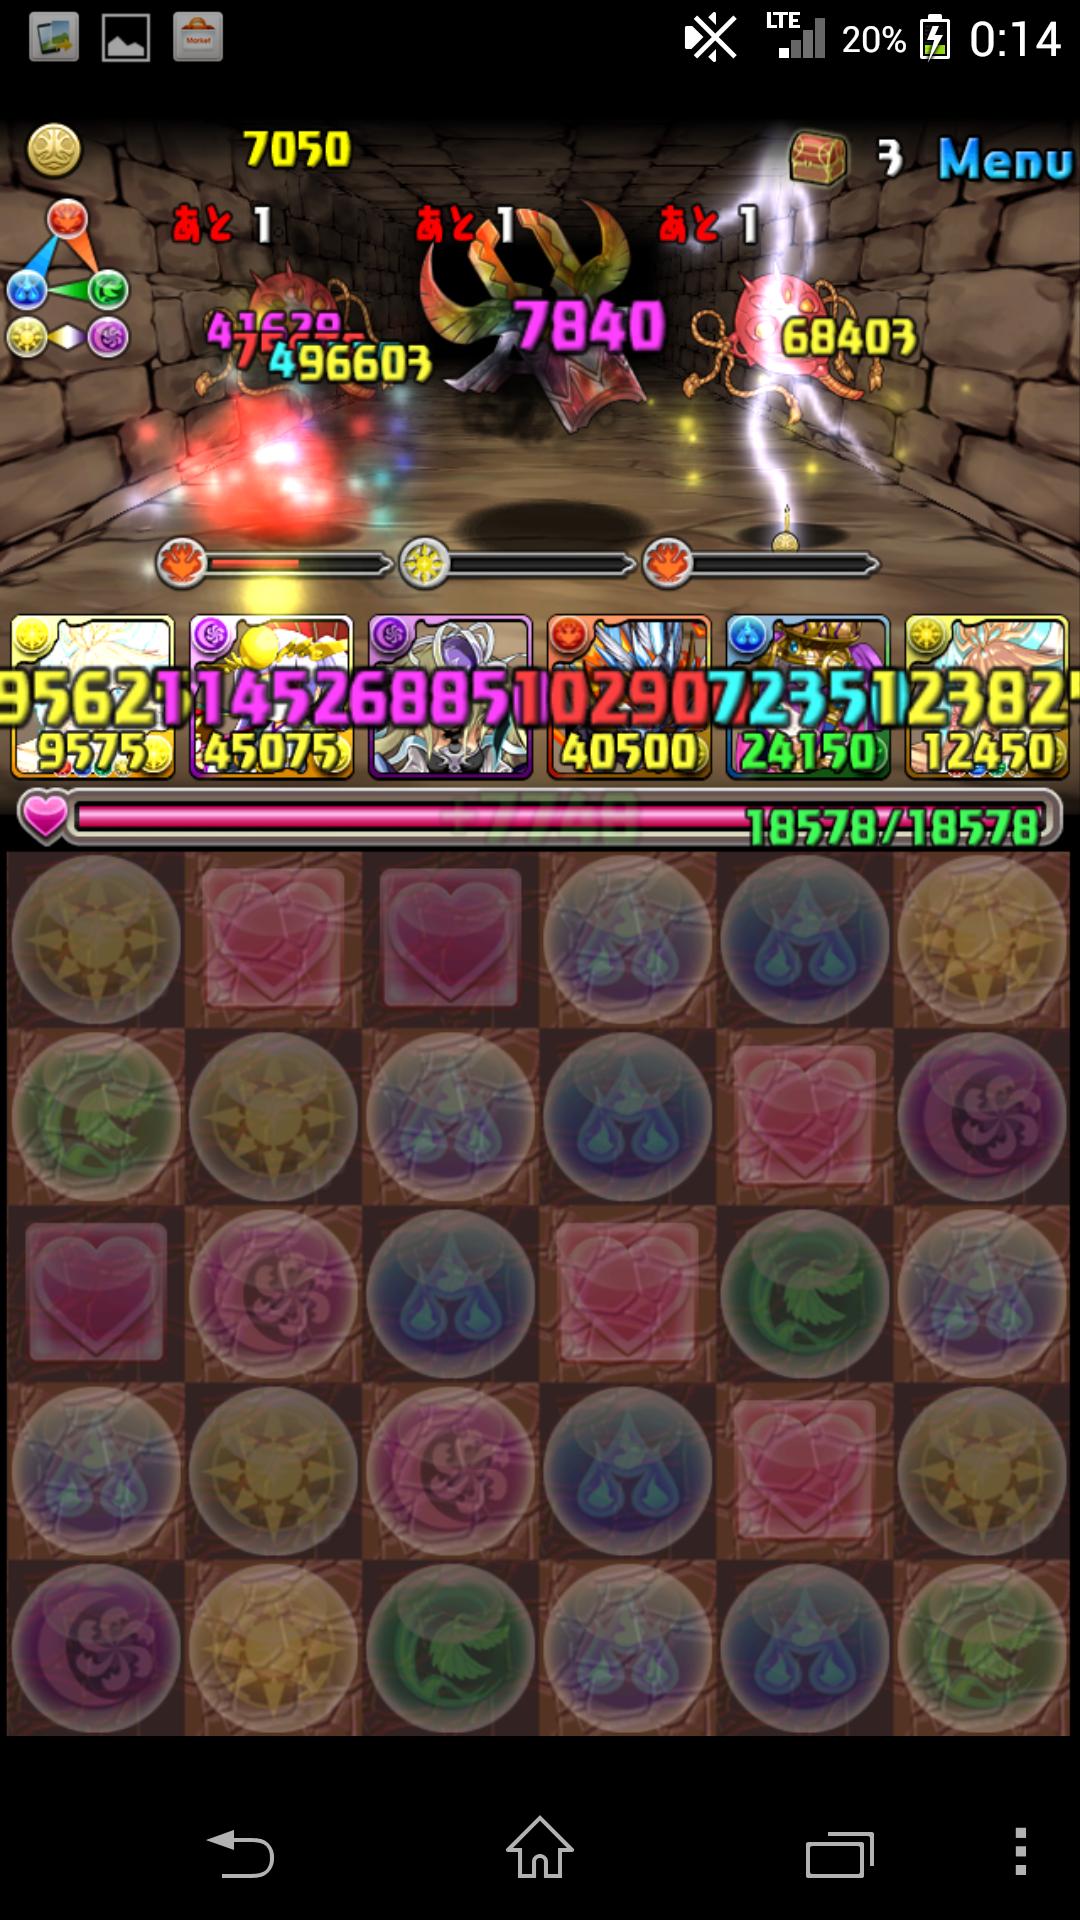 Screenshot_2014-05-07-00-14-55.png